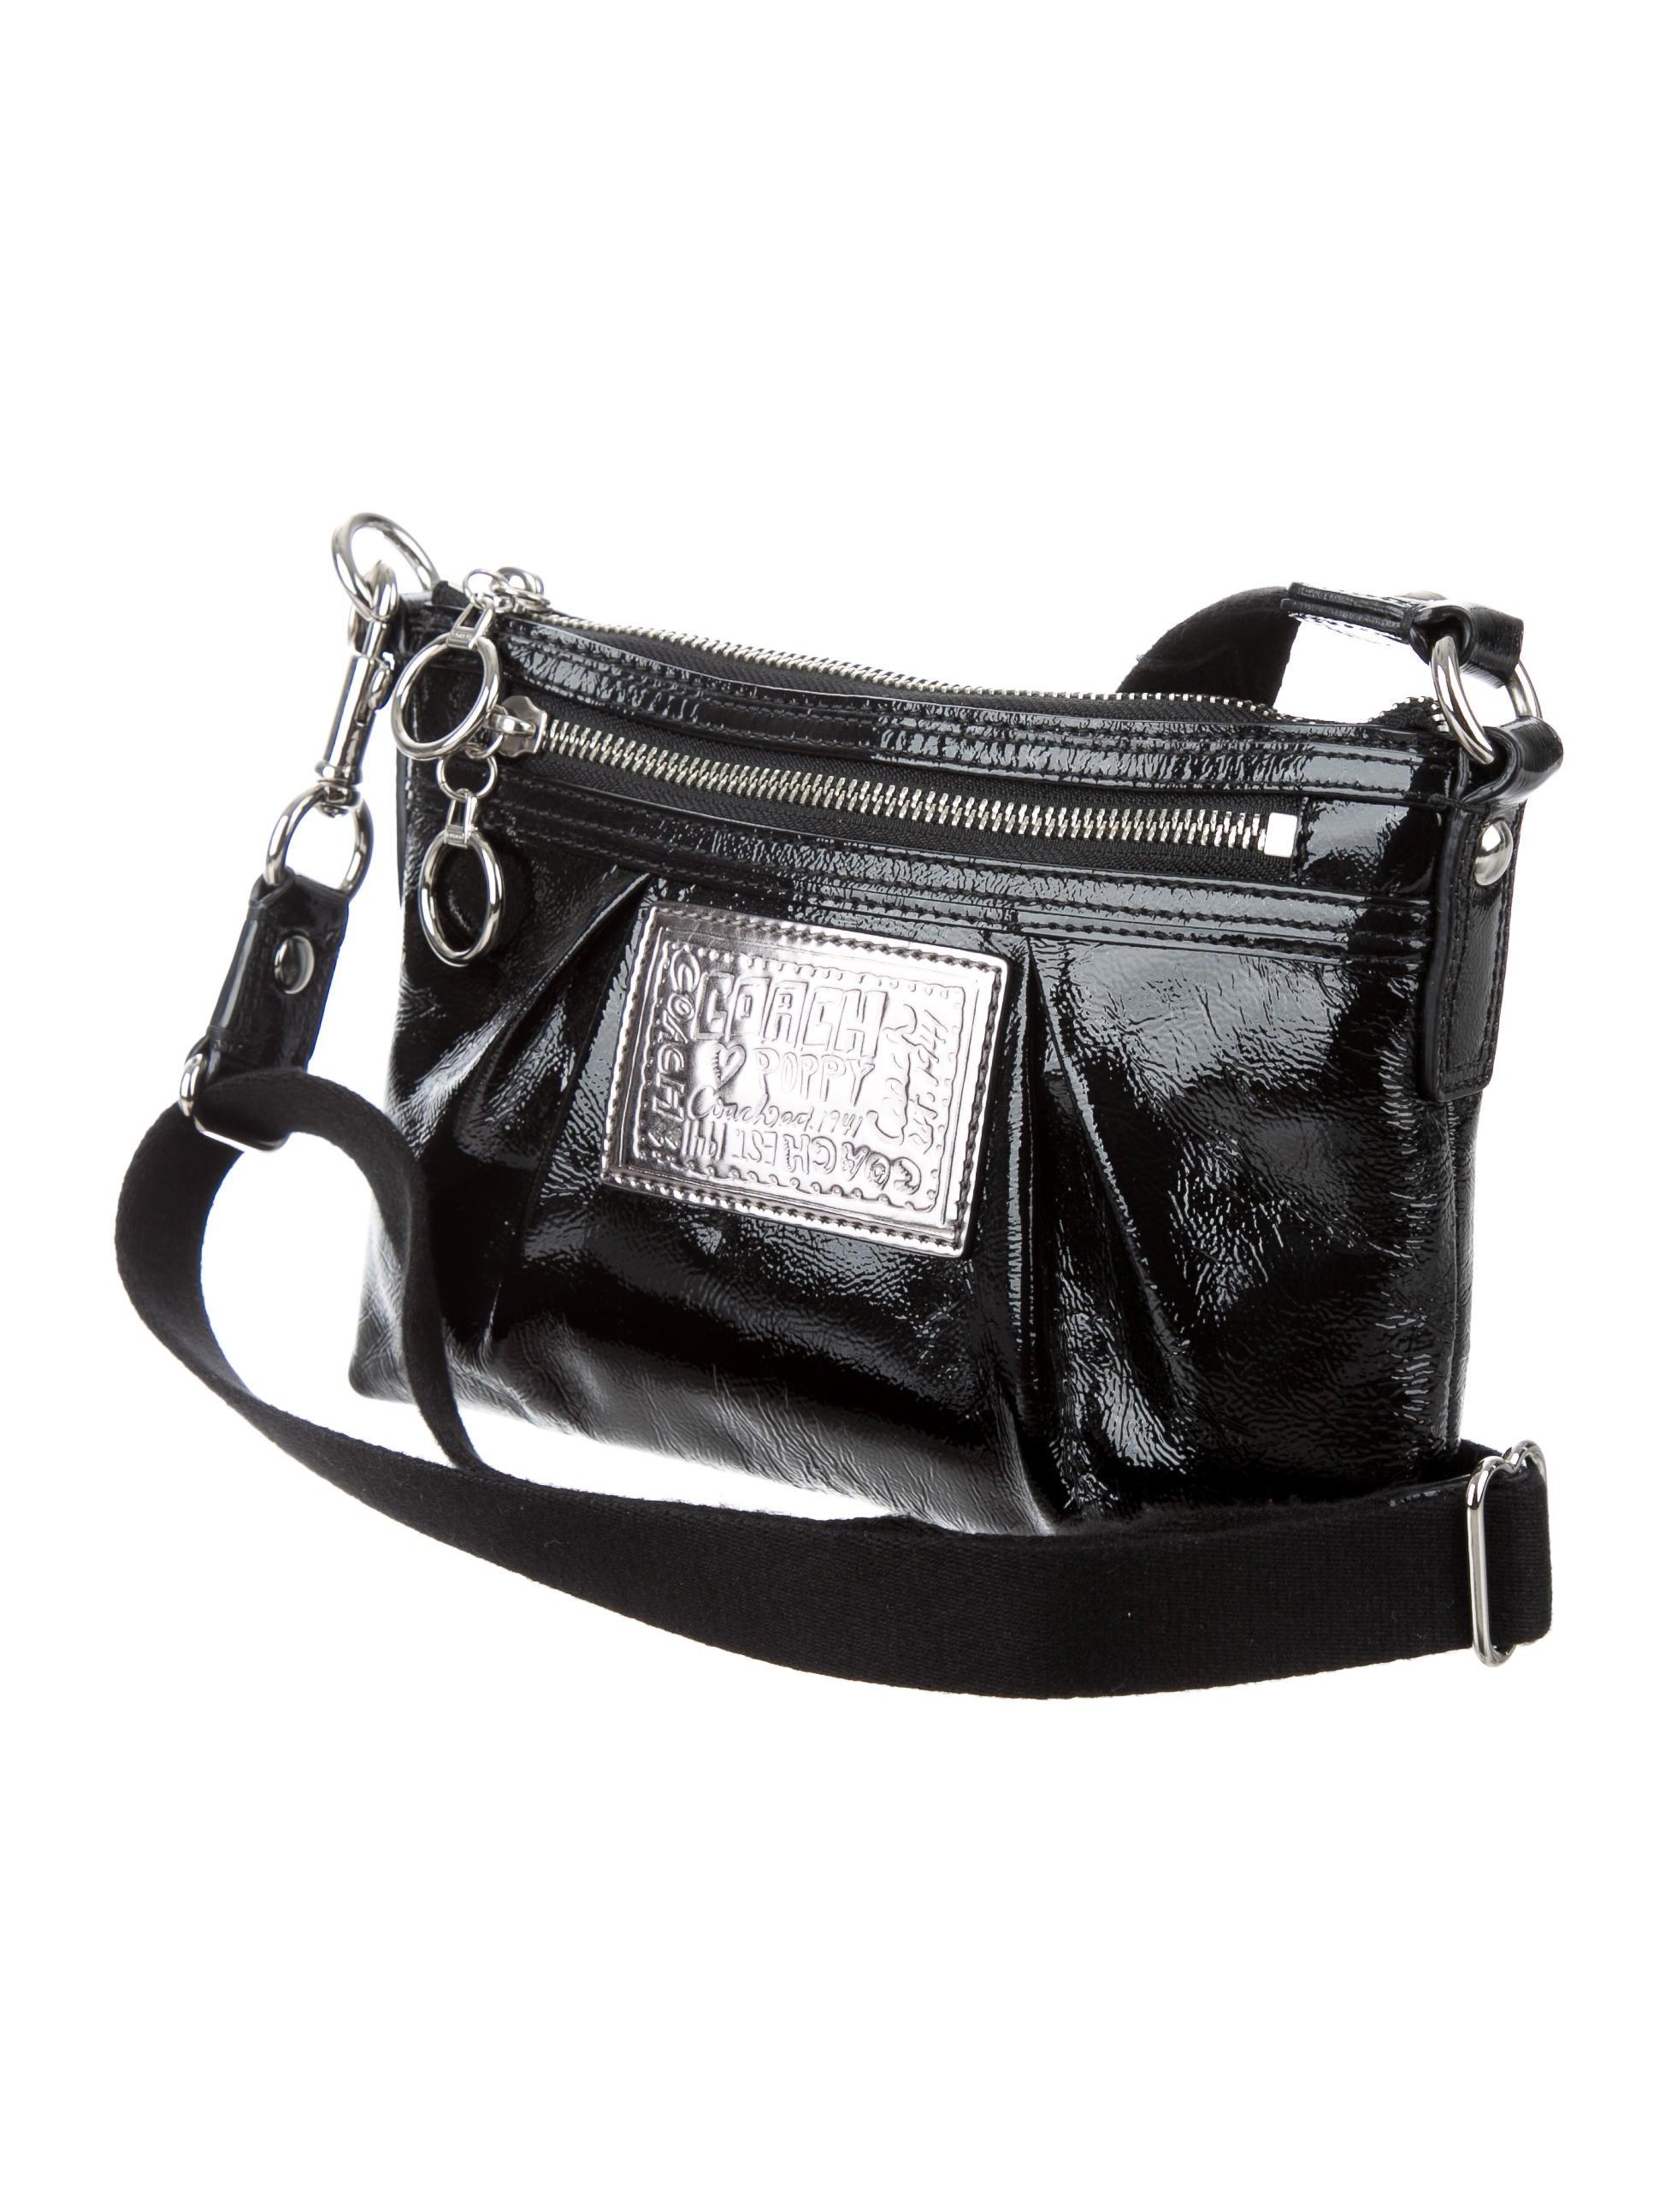 Black Patent Leather Coach Purse Iucn